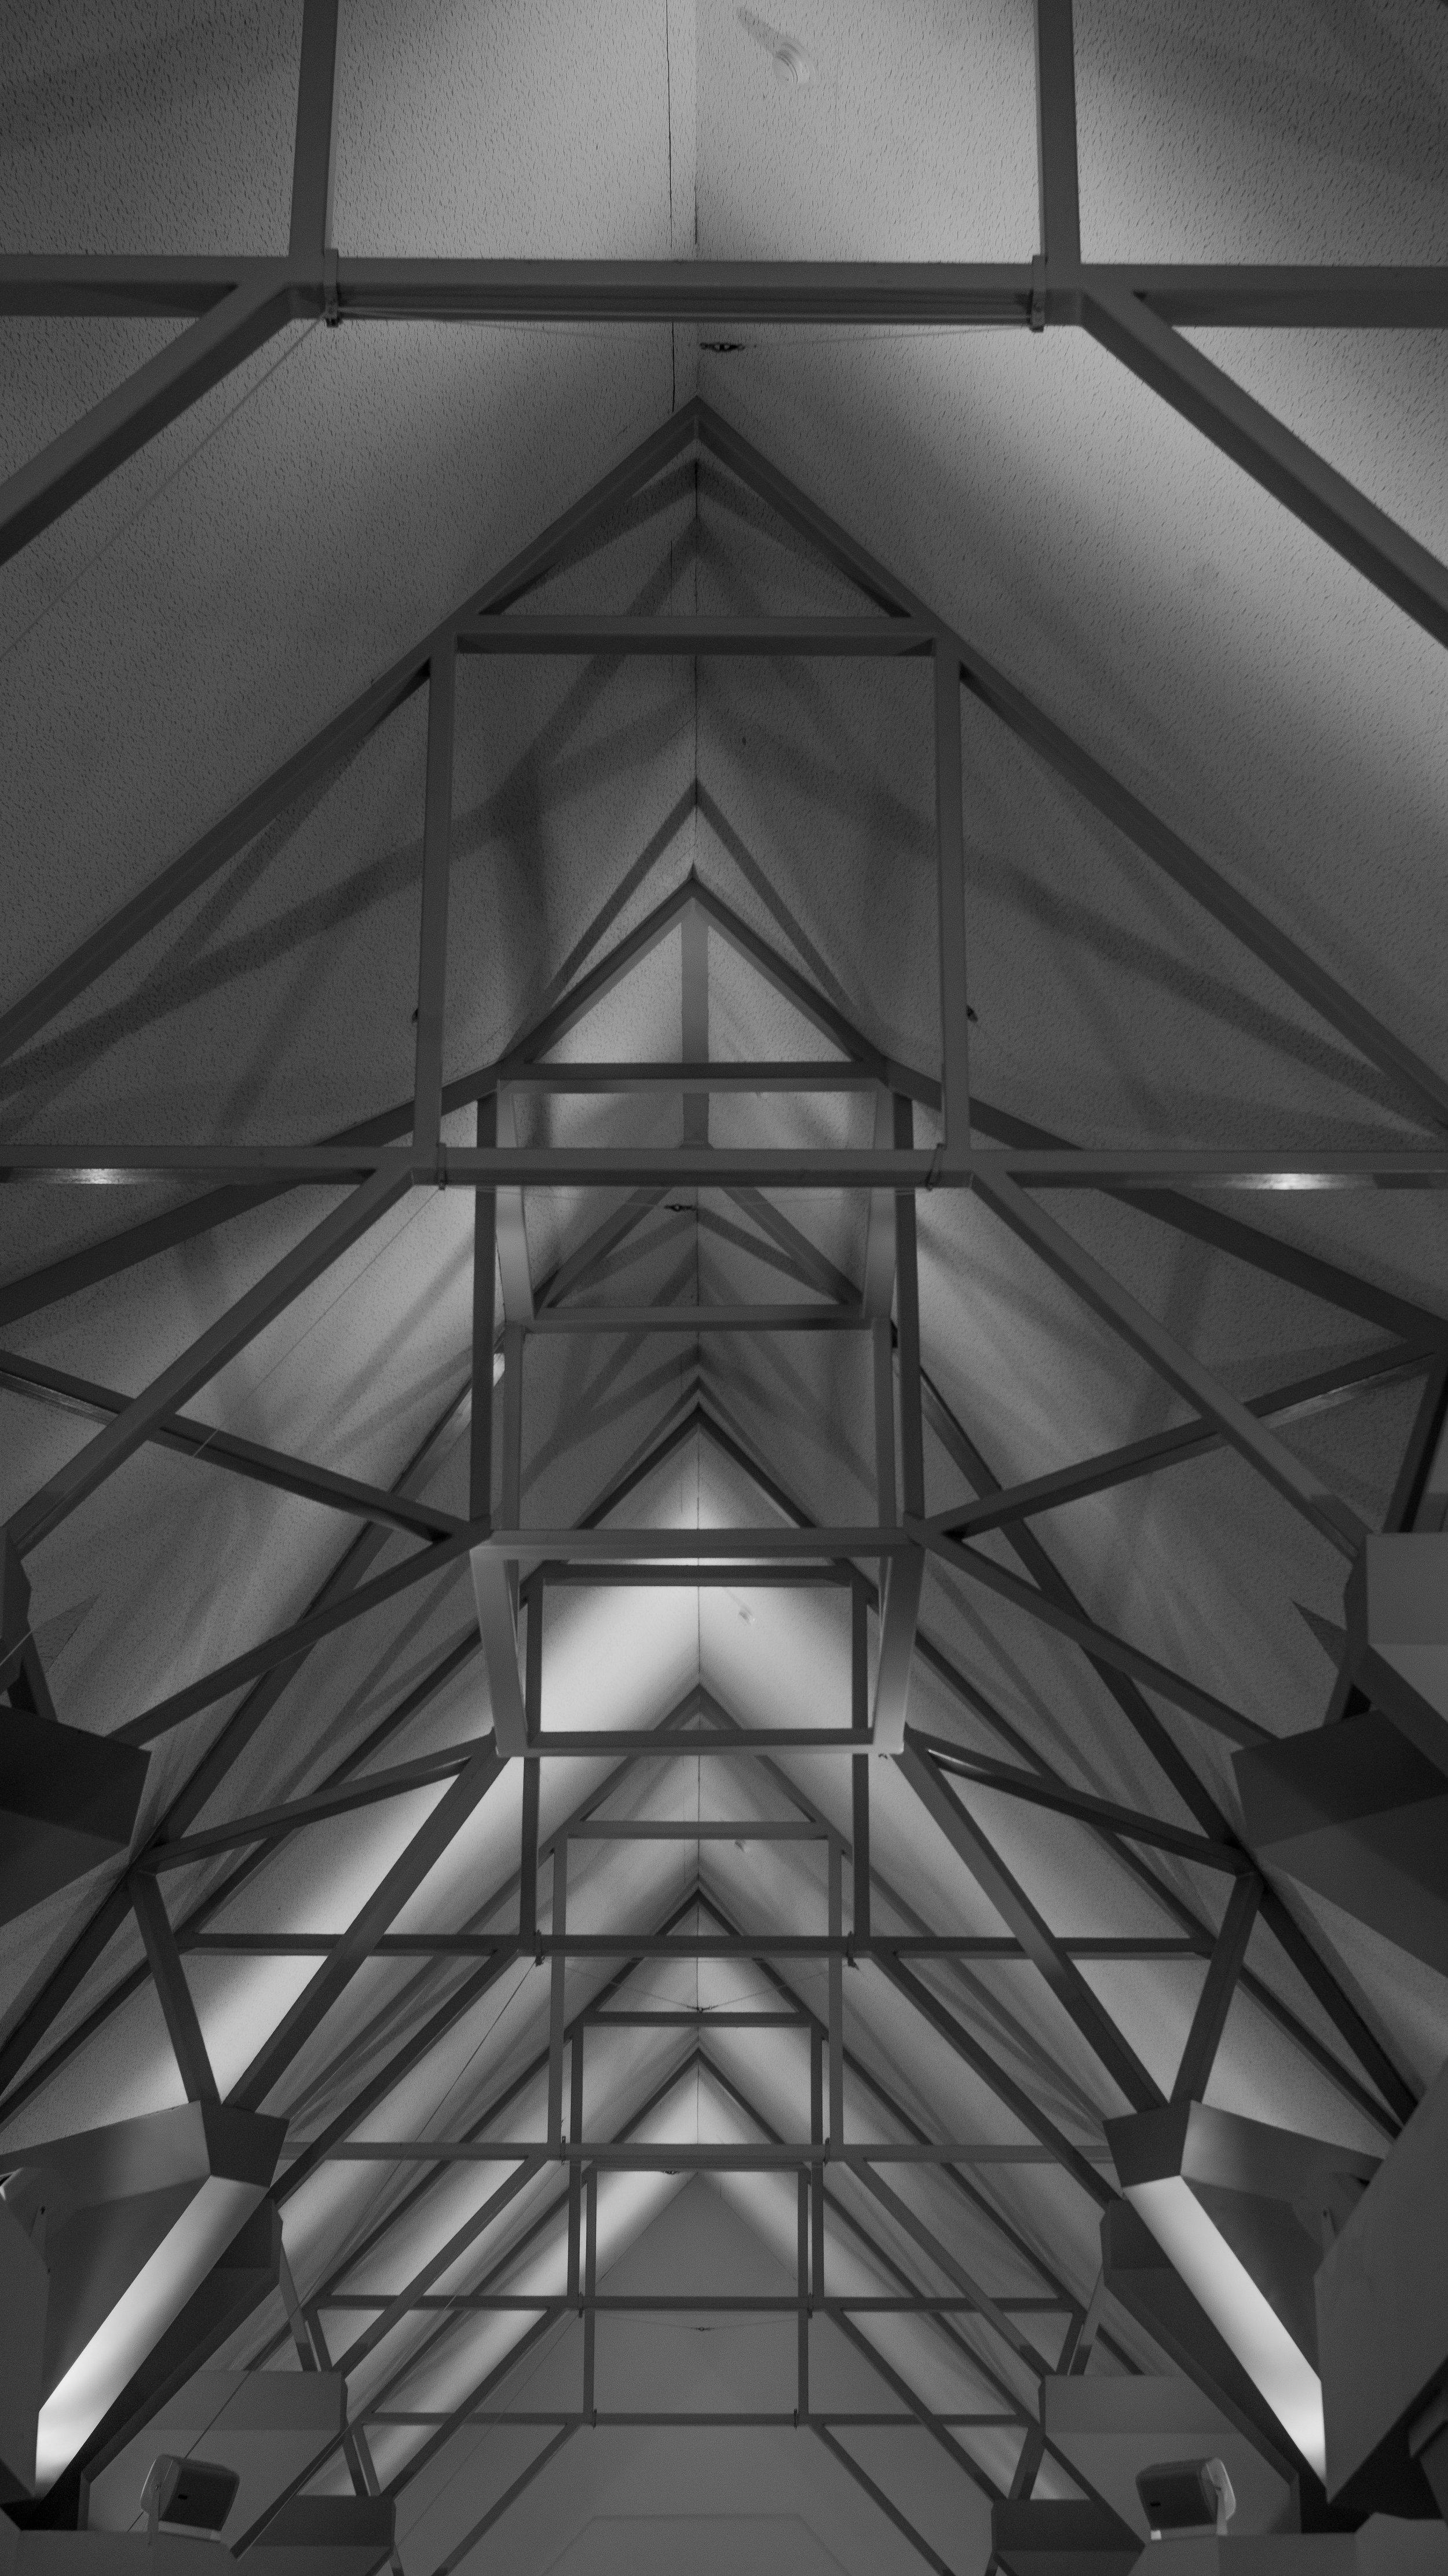 temple-of-symmetry.jpg